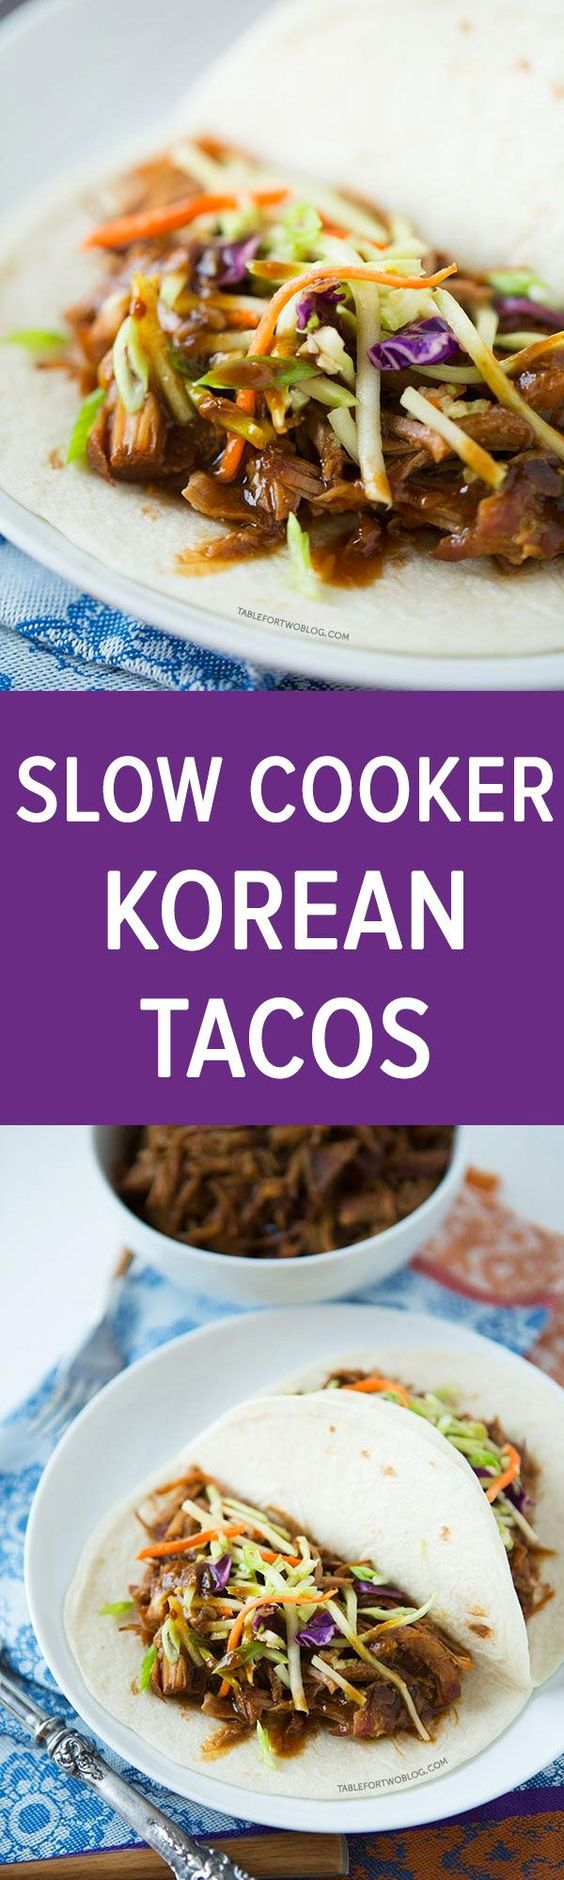 Tacos, Broccoli slaw and Slaw recipes on Pinterest